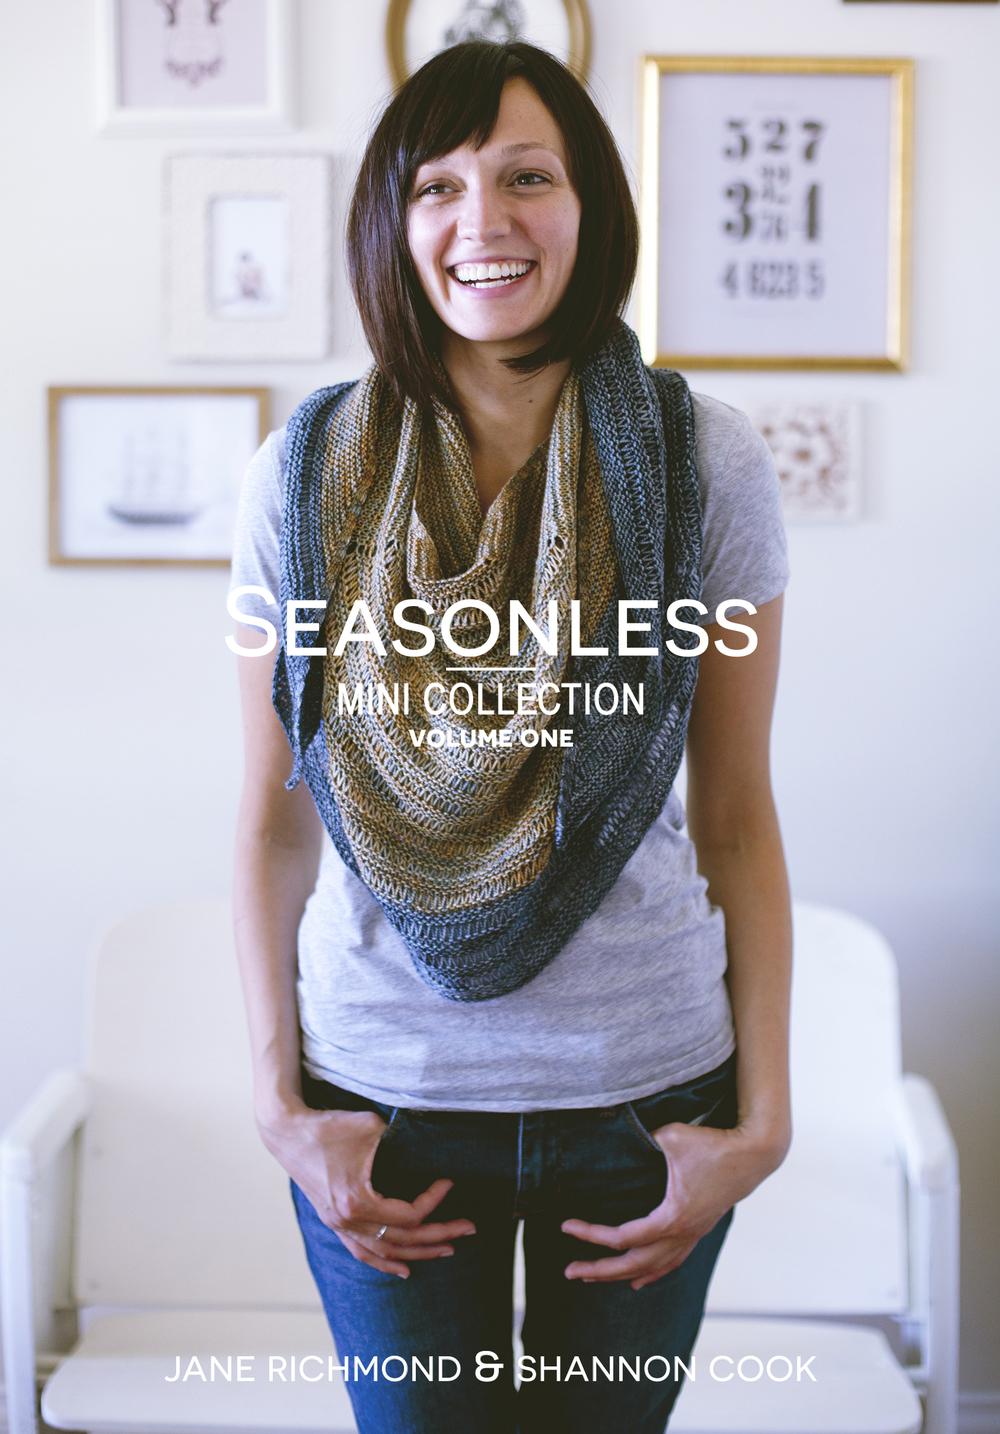 Seasonless by Shannon Cook & Jane Richmond